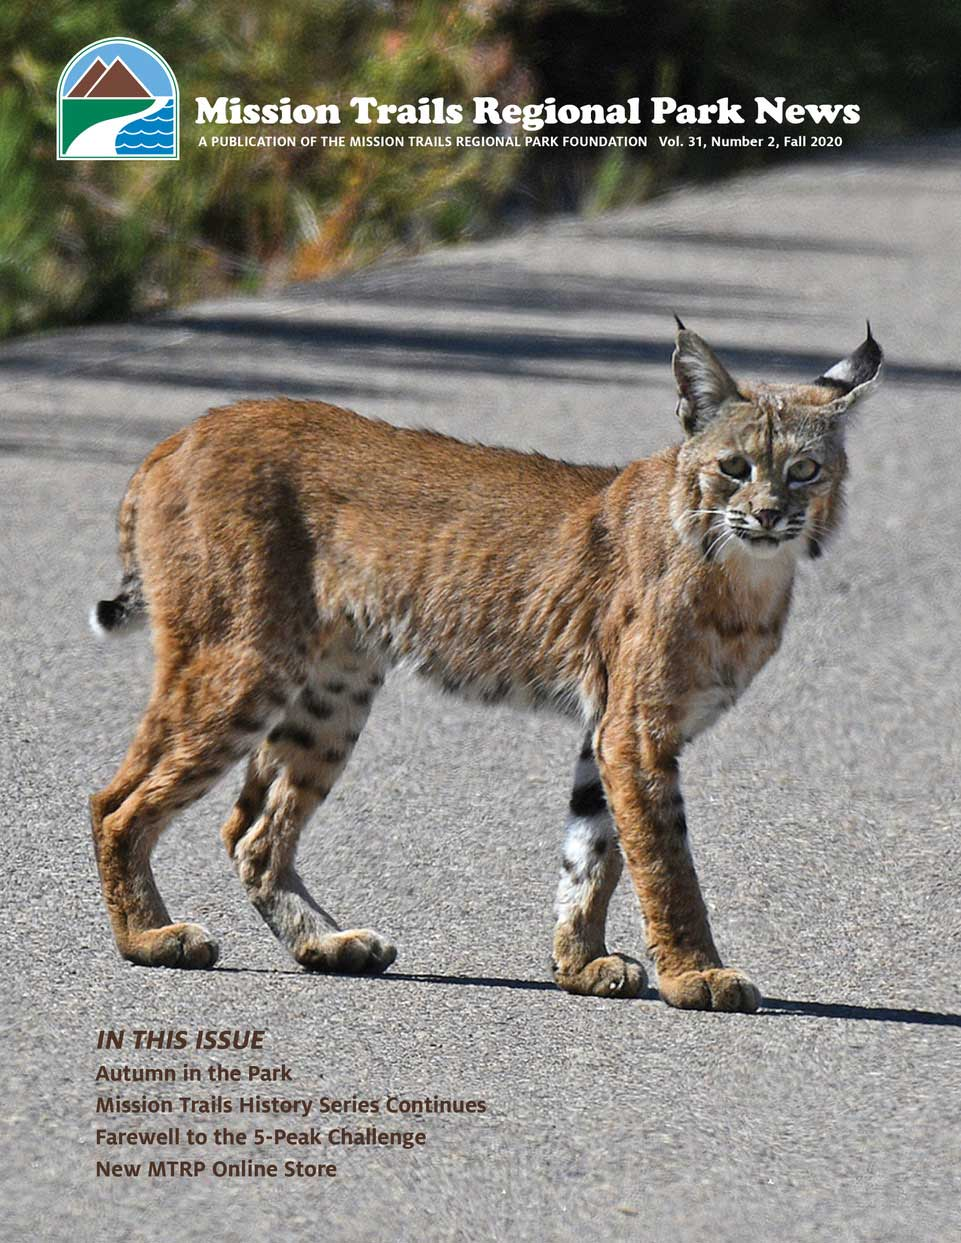 Mission Trails Regional Park News cover image